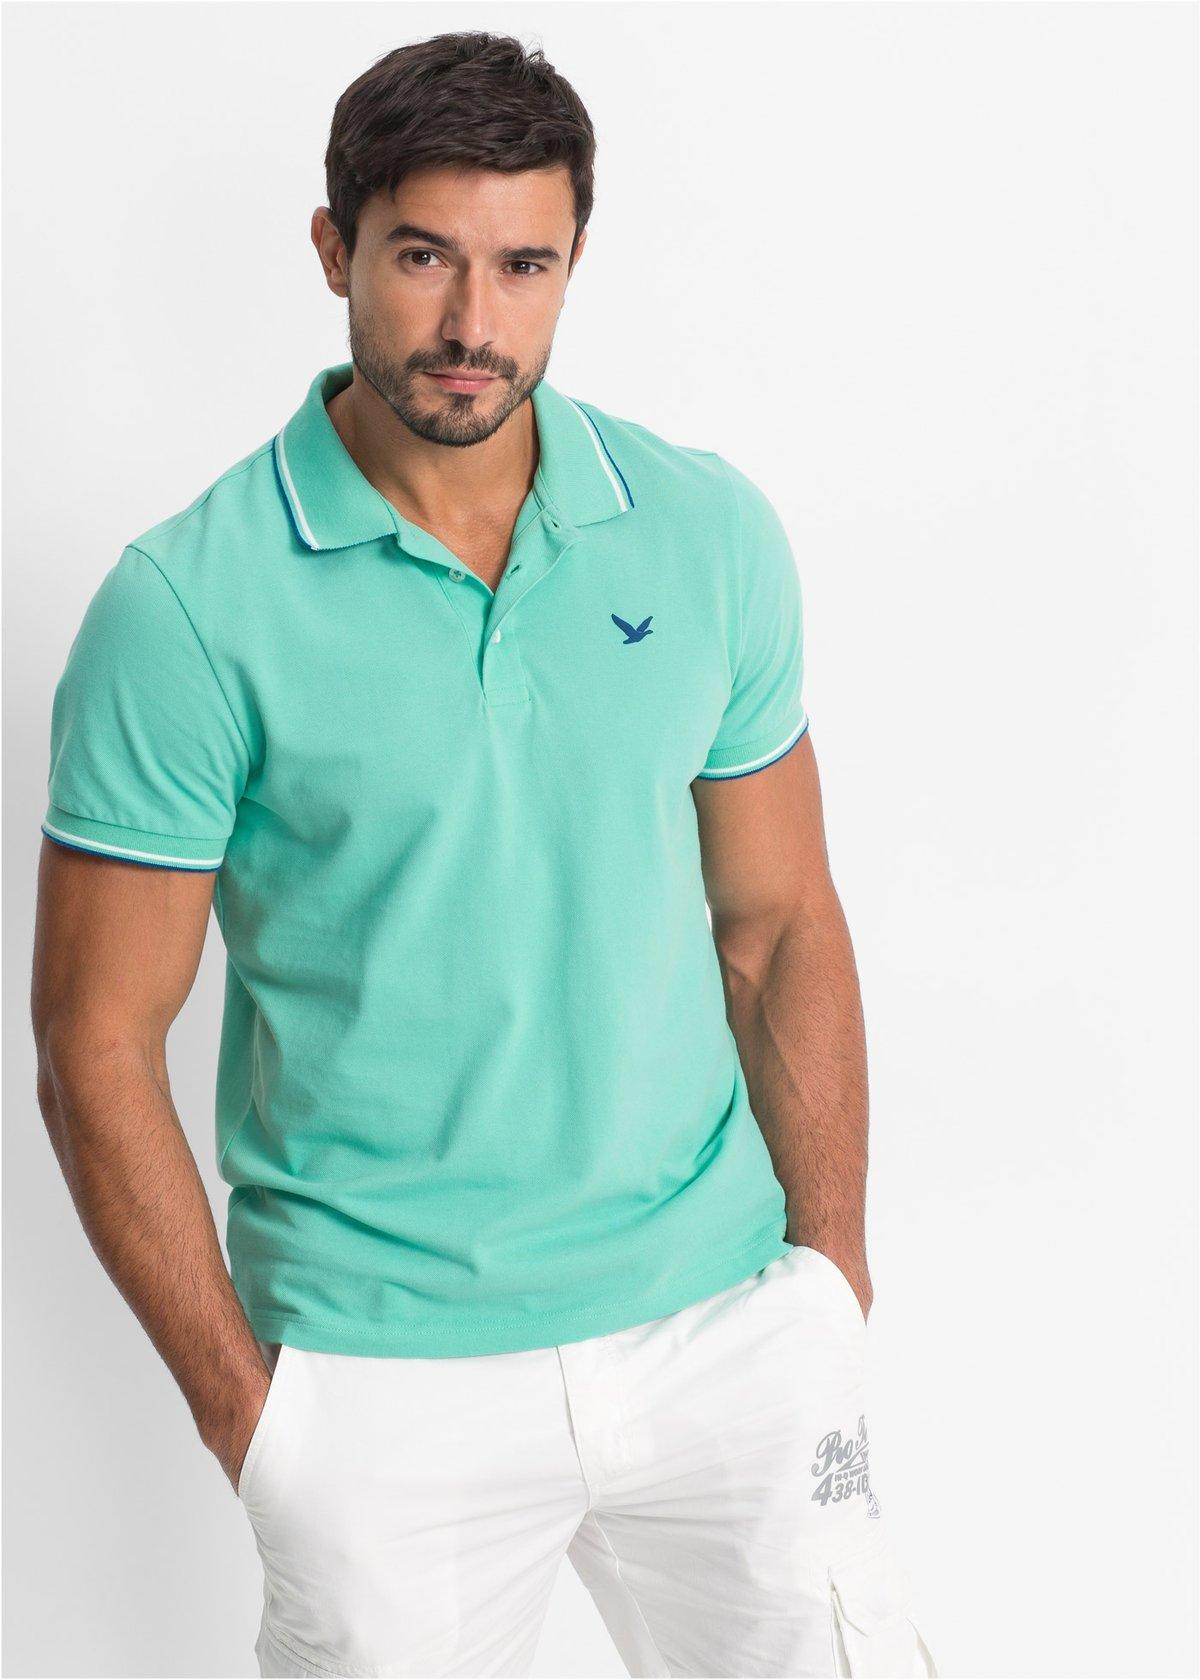 картинки мужские футболки и поло чертами стиля рококо